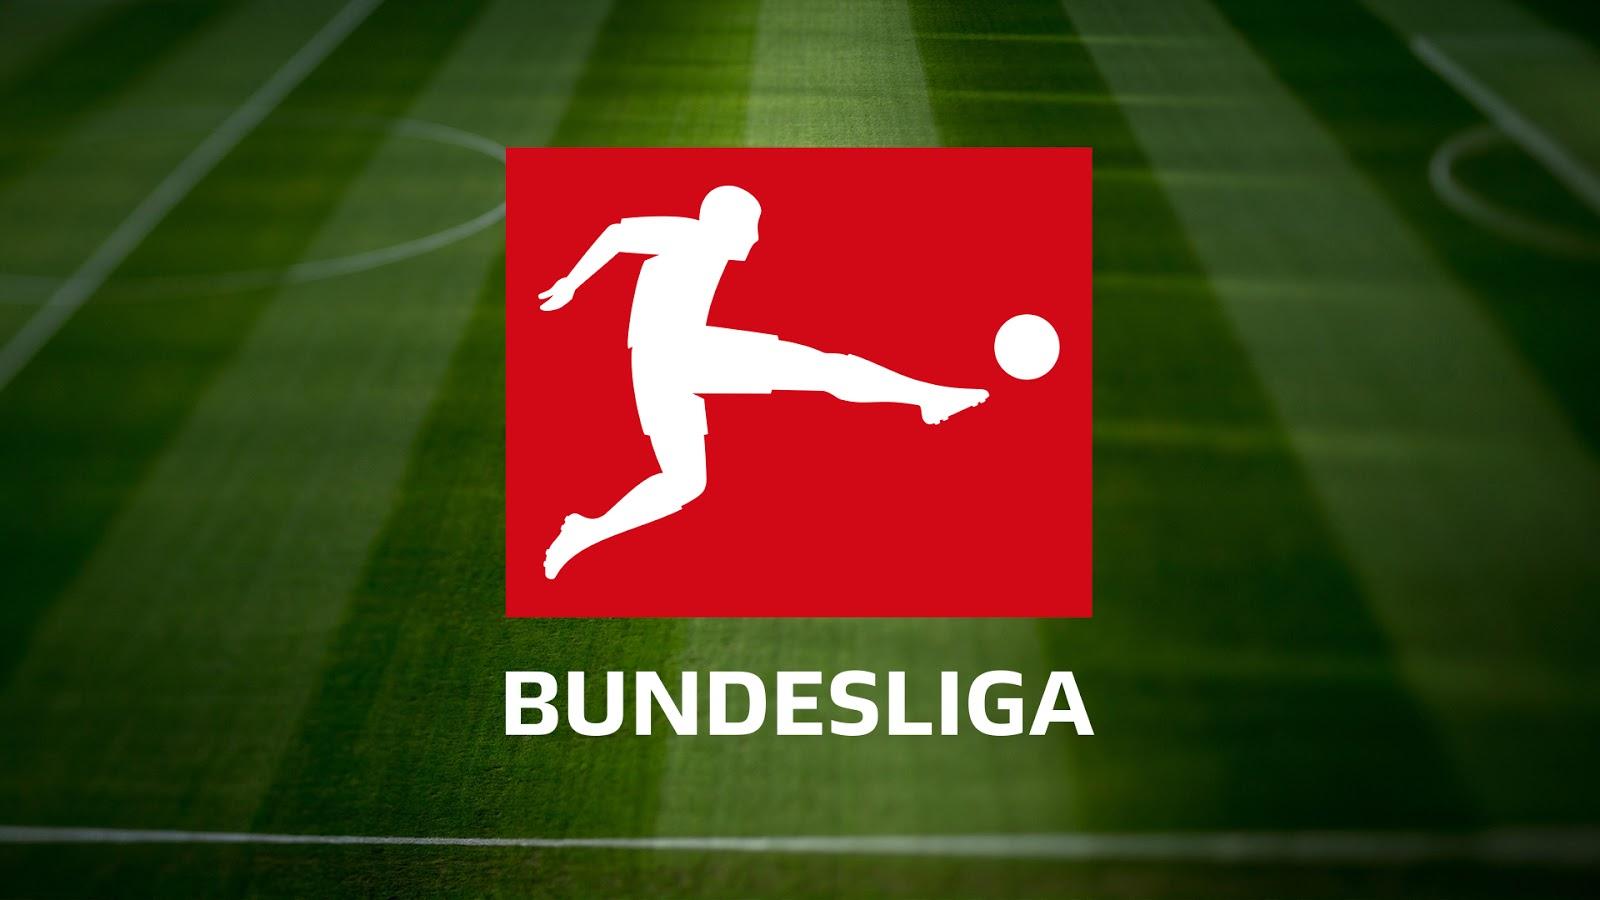 Bundesliga Wins Multiple Awards in China - Most